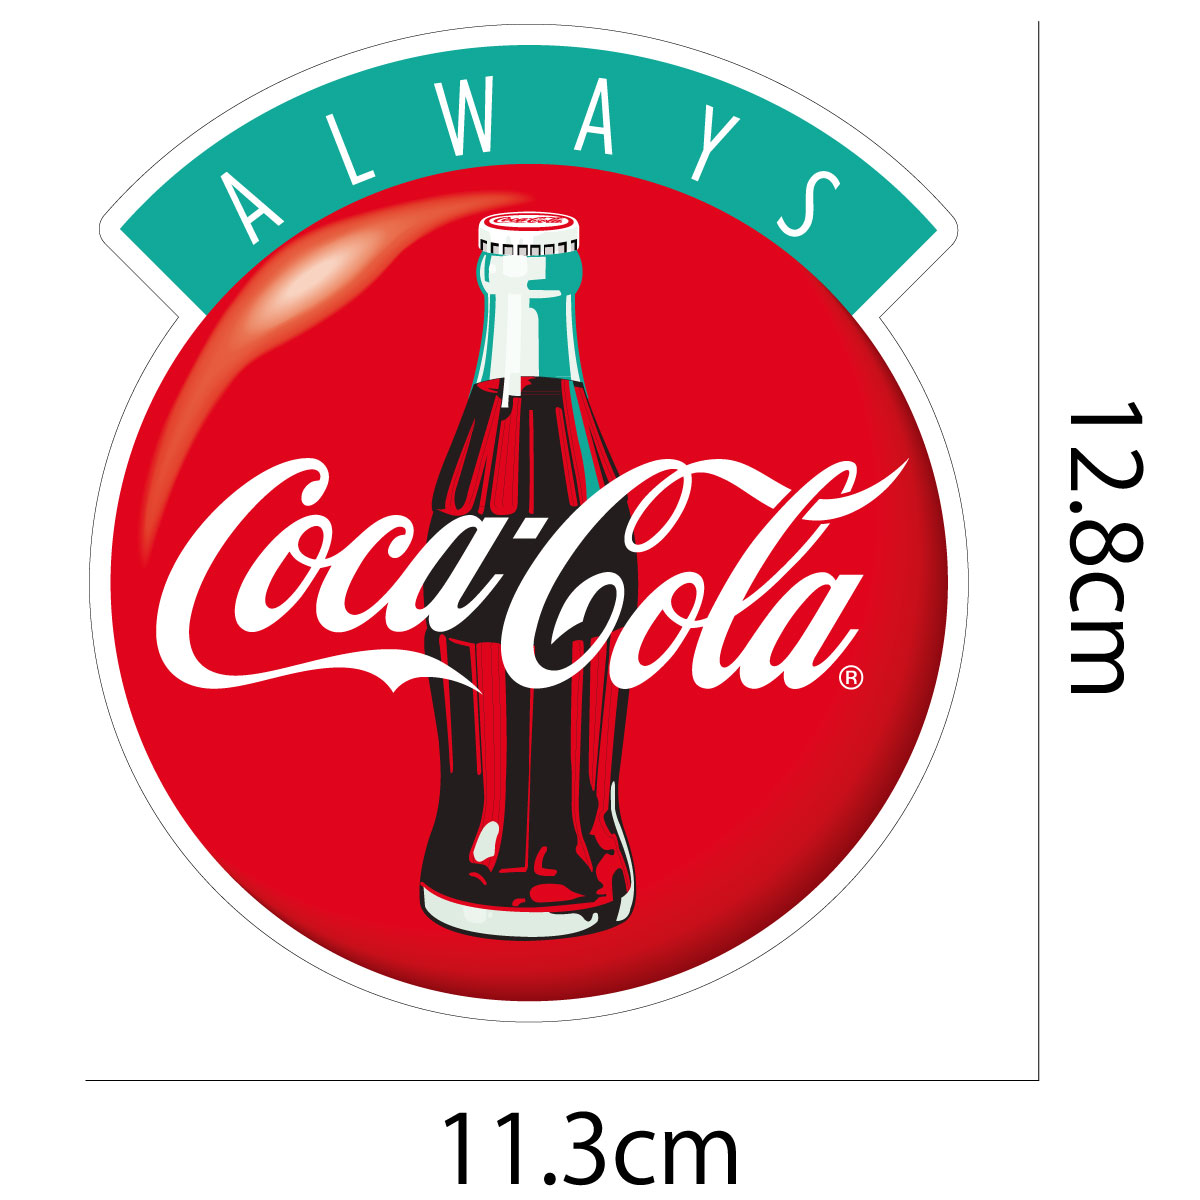 Coca-Cola☆CC-BS15★コカ・コーラ ステッカー★ALWAYS Coca-Cola/コカ・コーラ